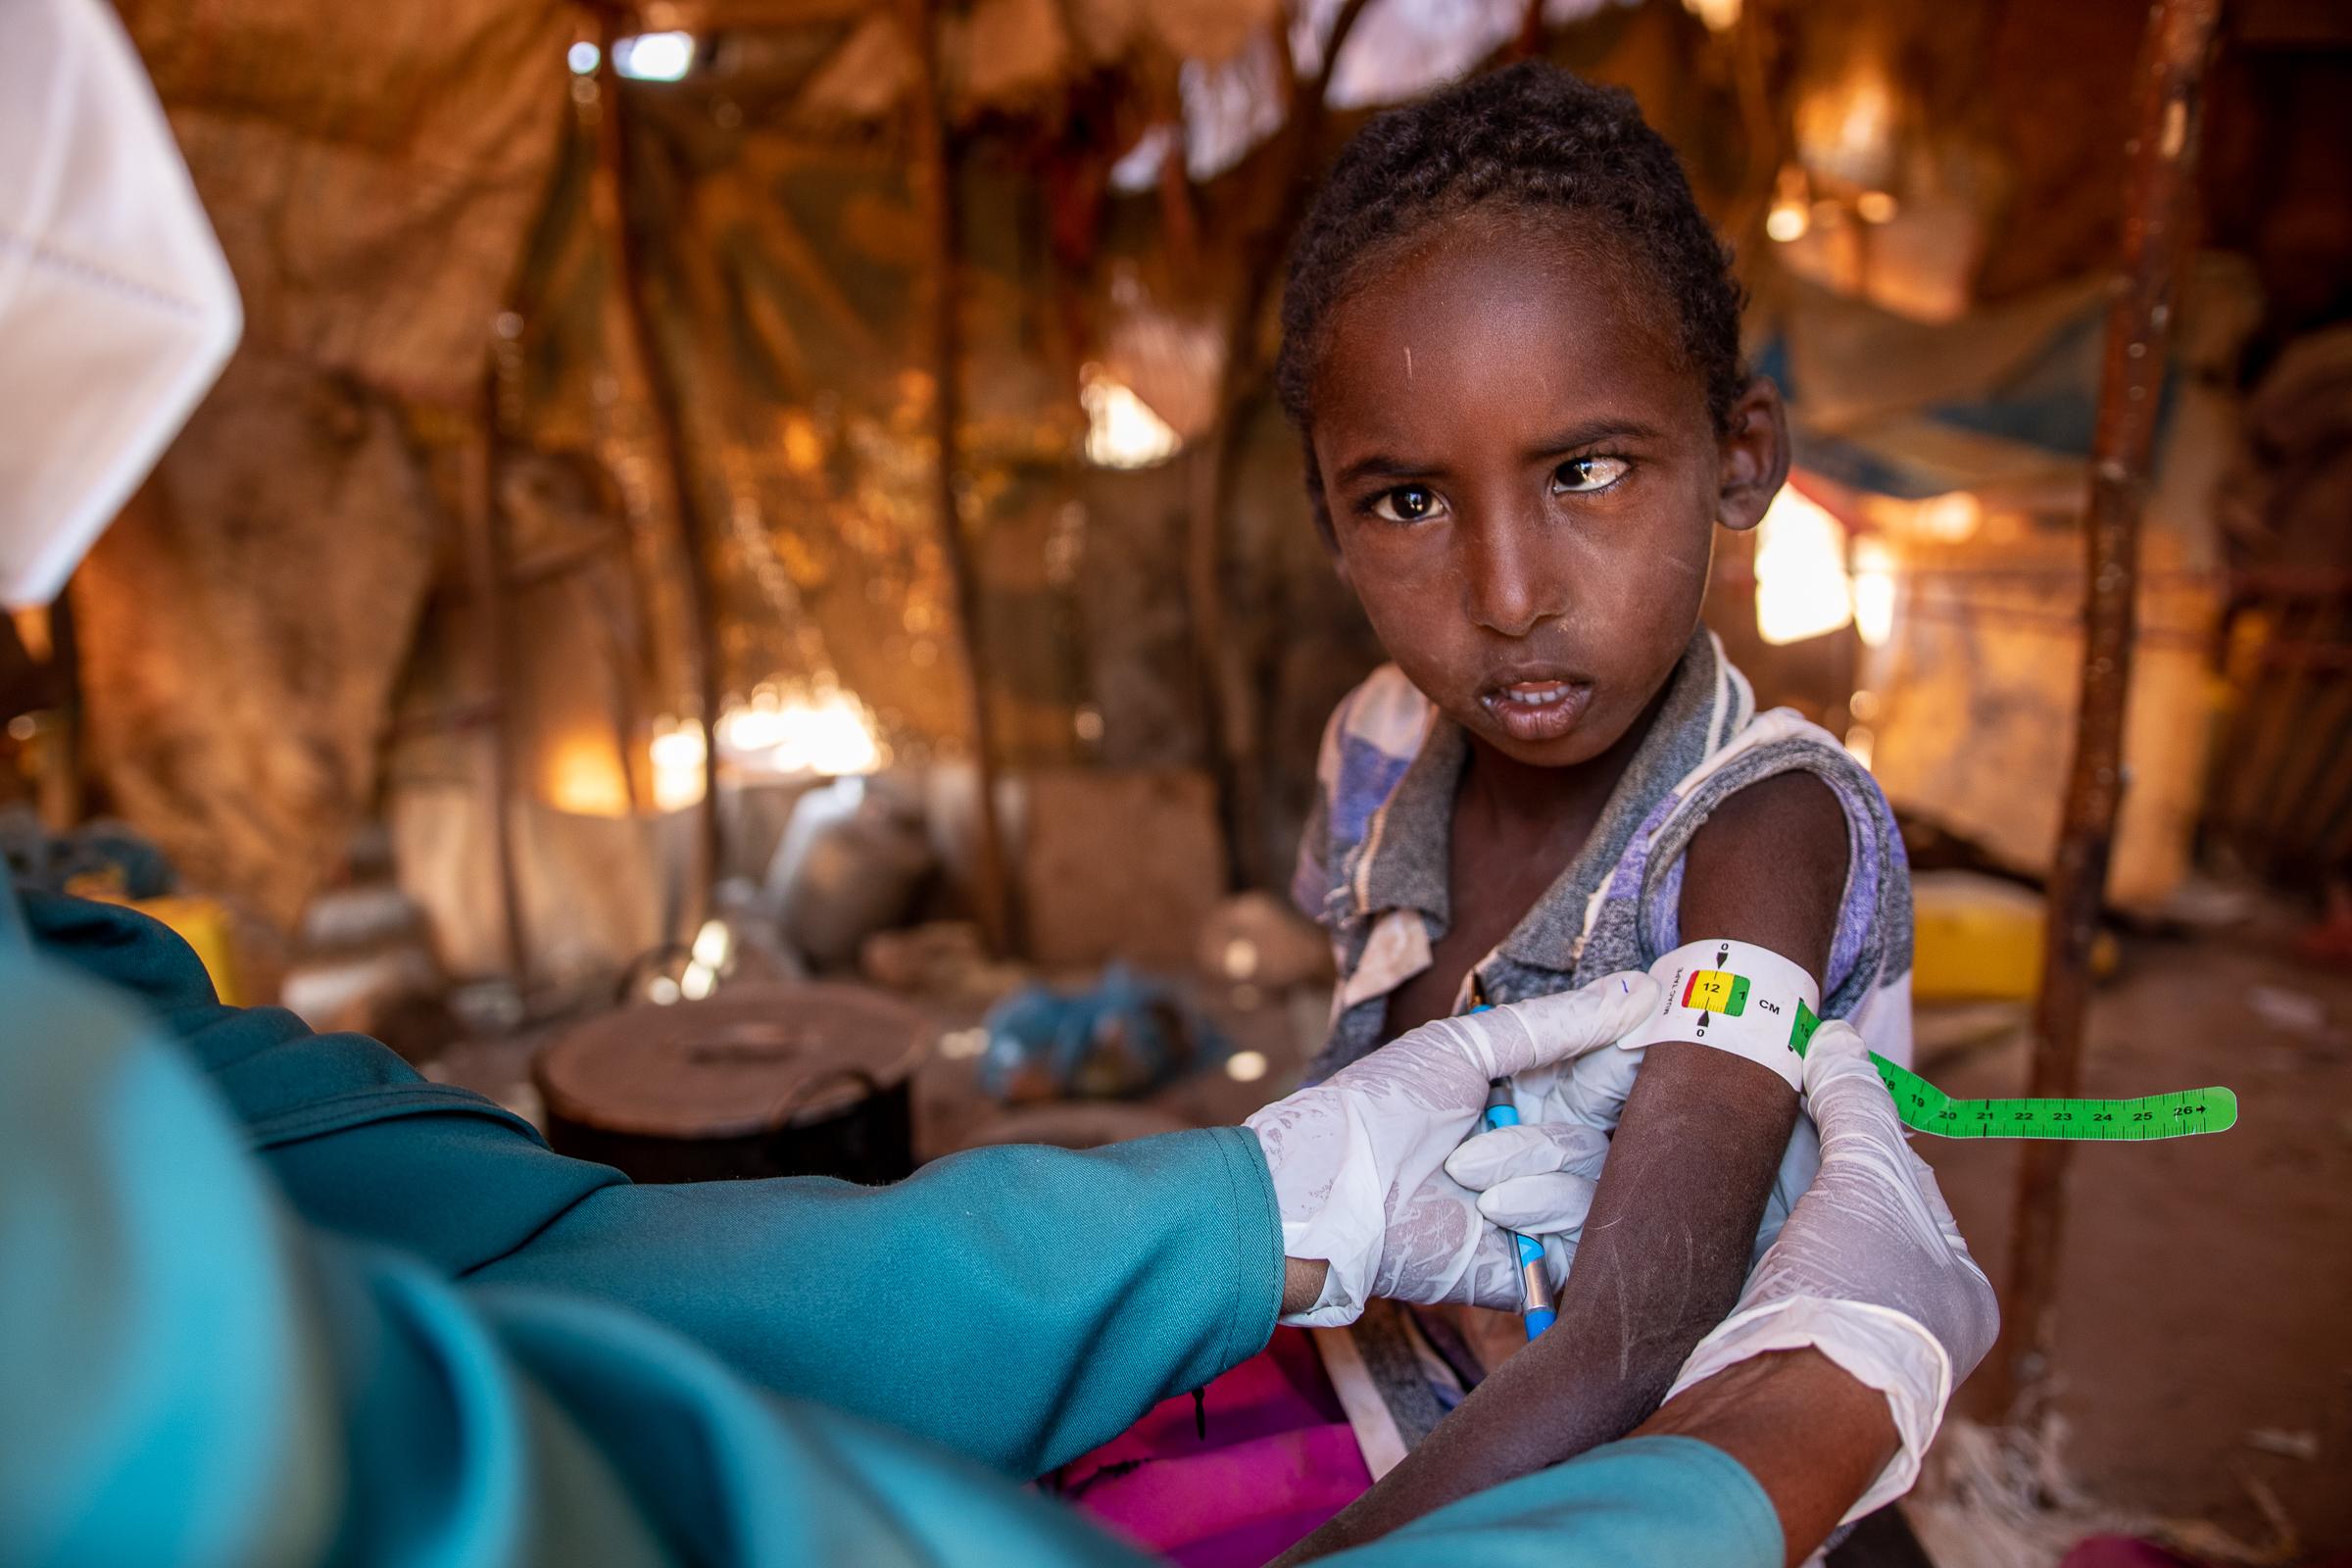 Muna checks a child for malnutrition